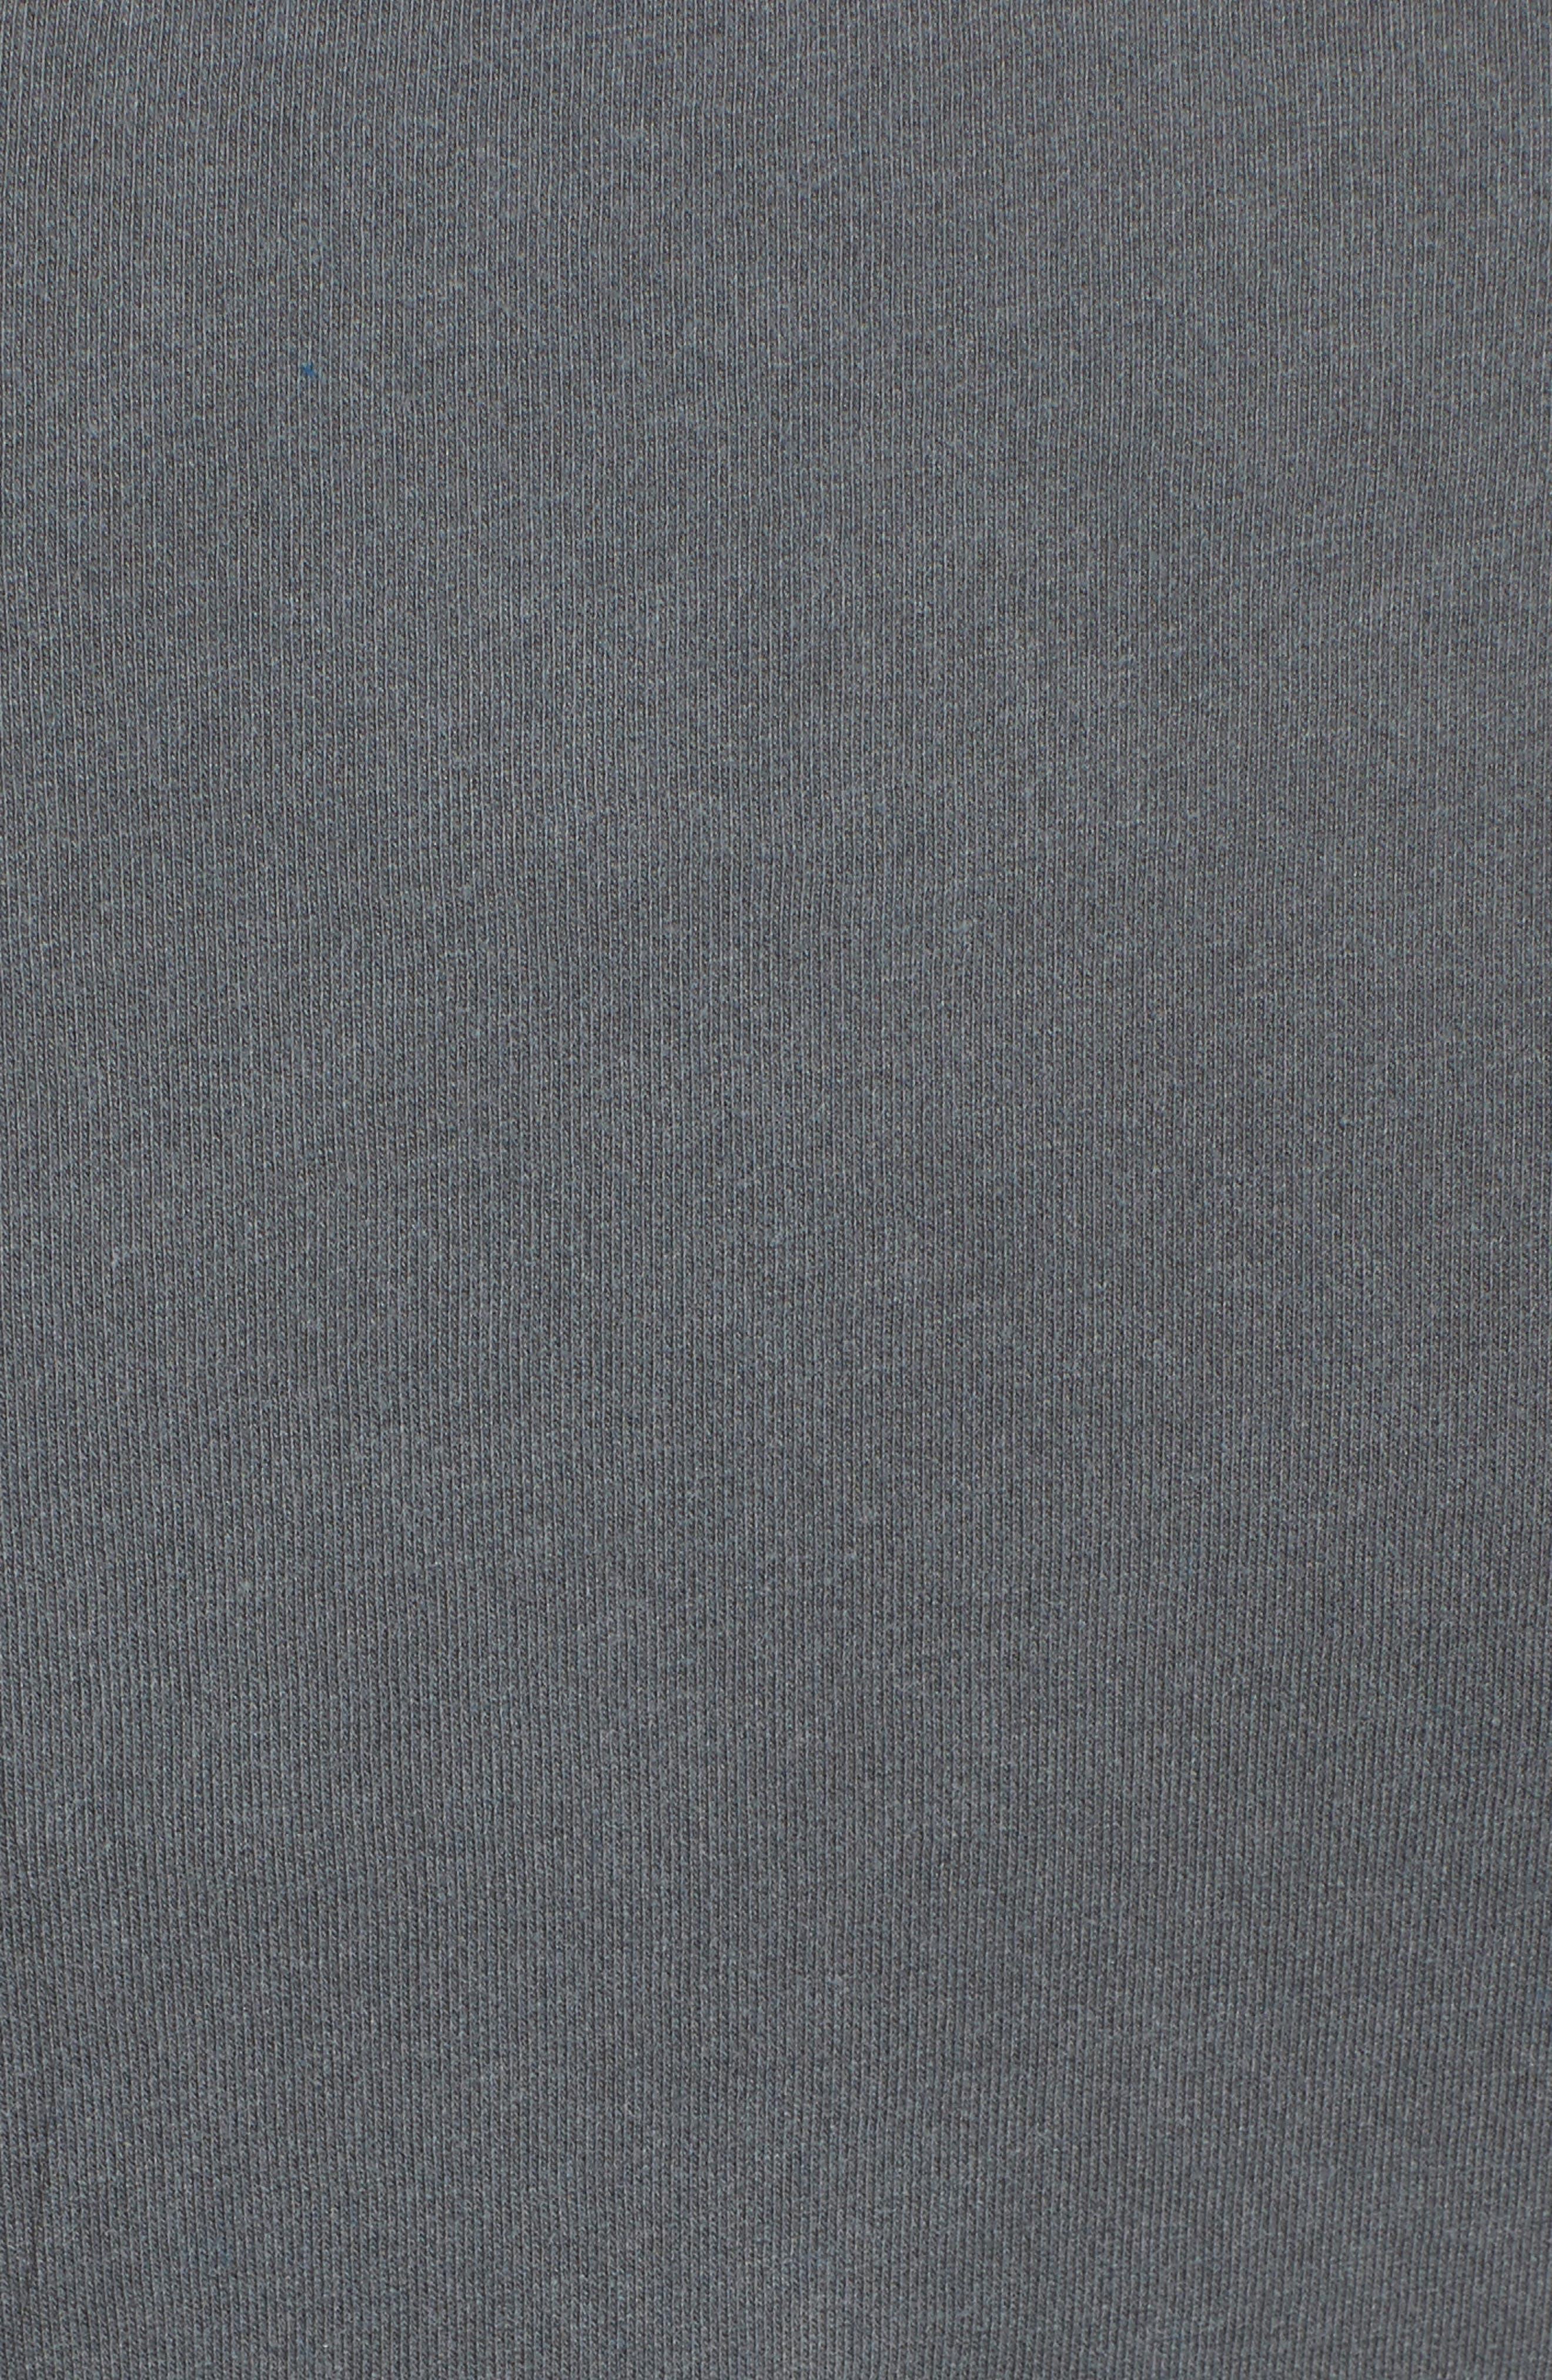 Alternate Image 5  - Stateside Twist Dress